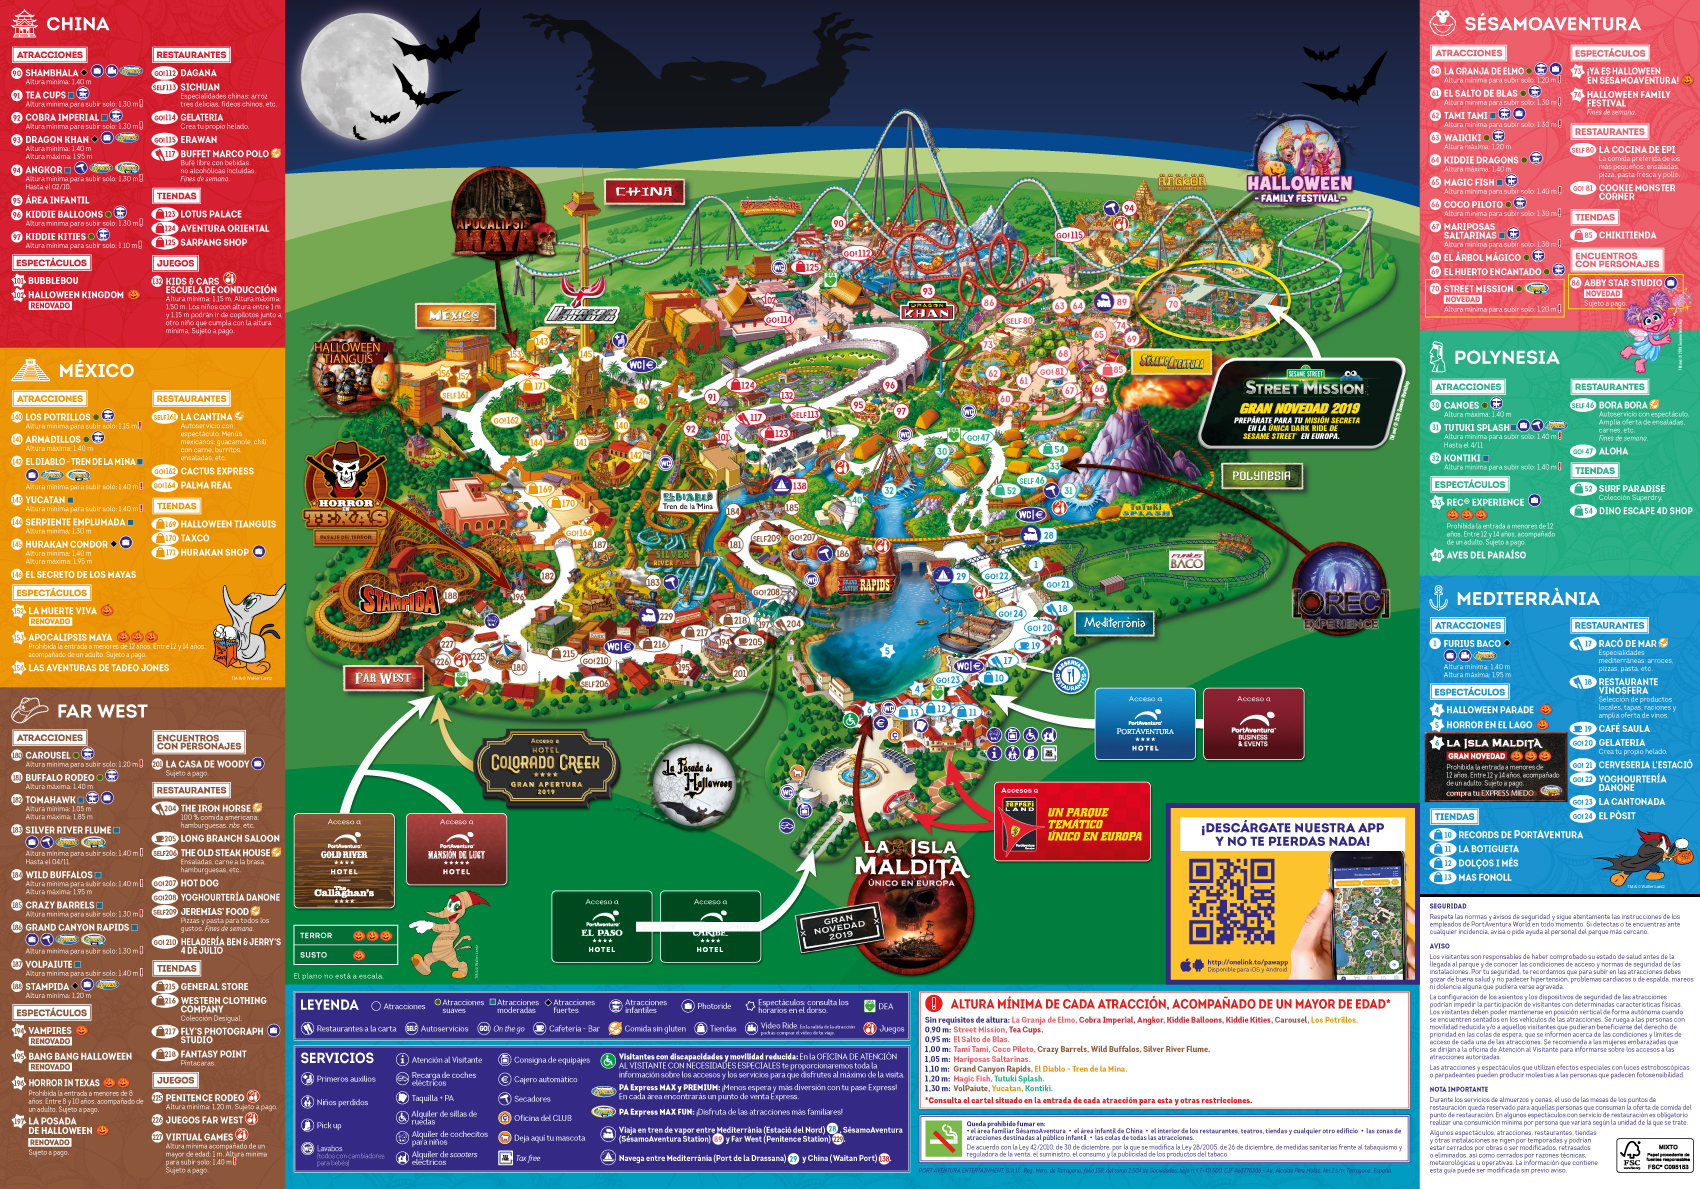 Mapa Port Aventura 2019.Halloween En Portaventura Park Portaventura World